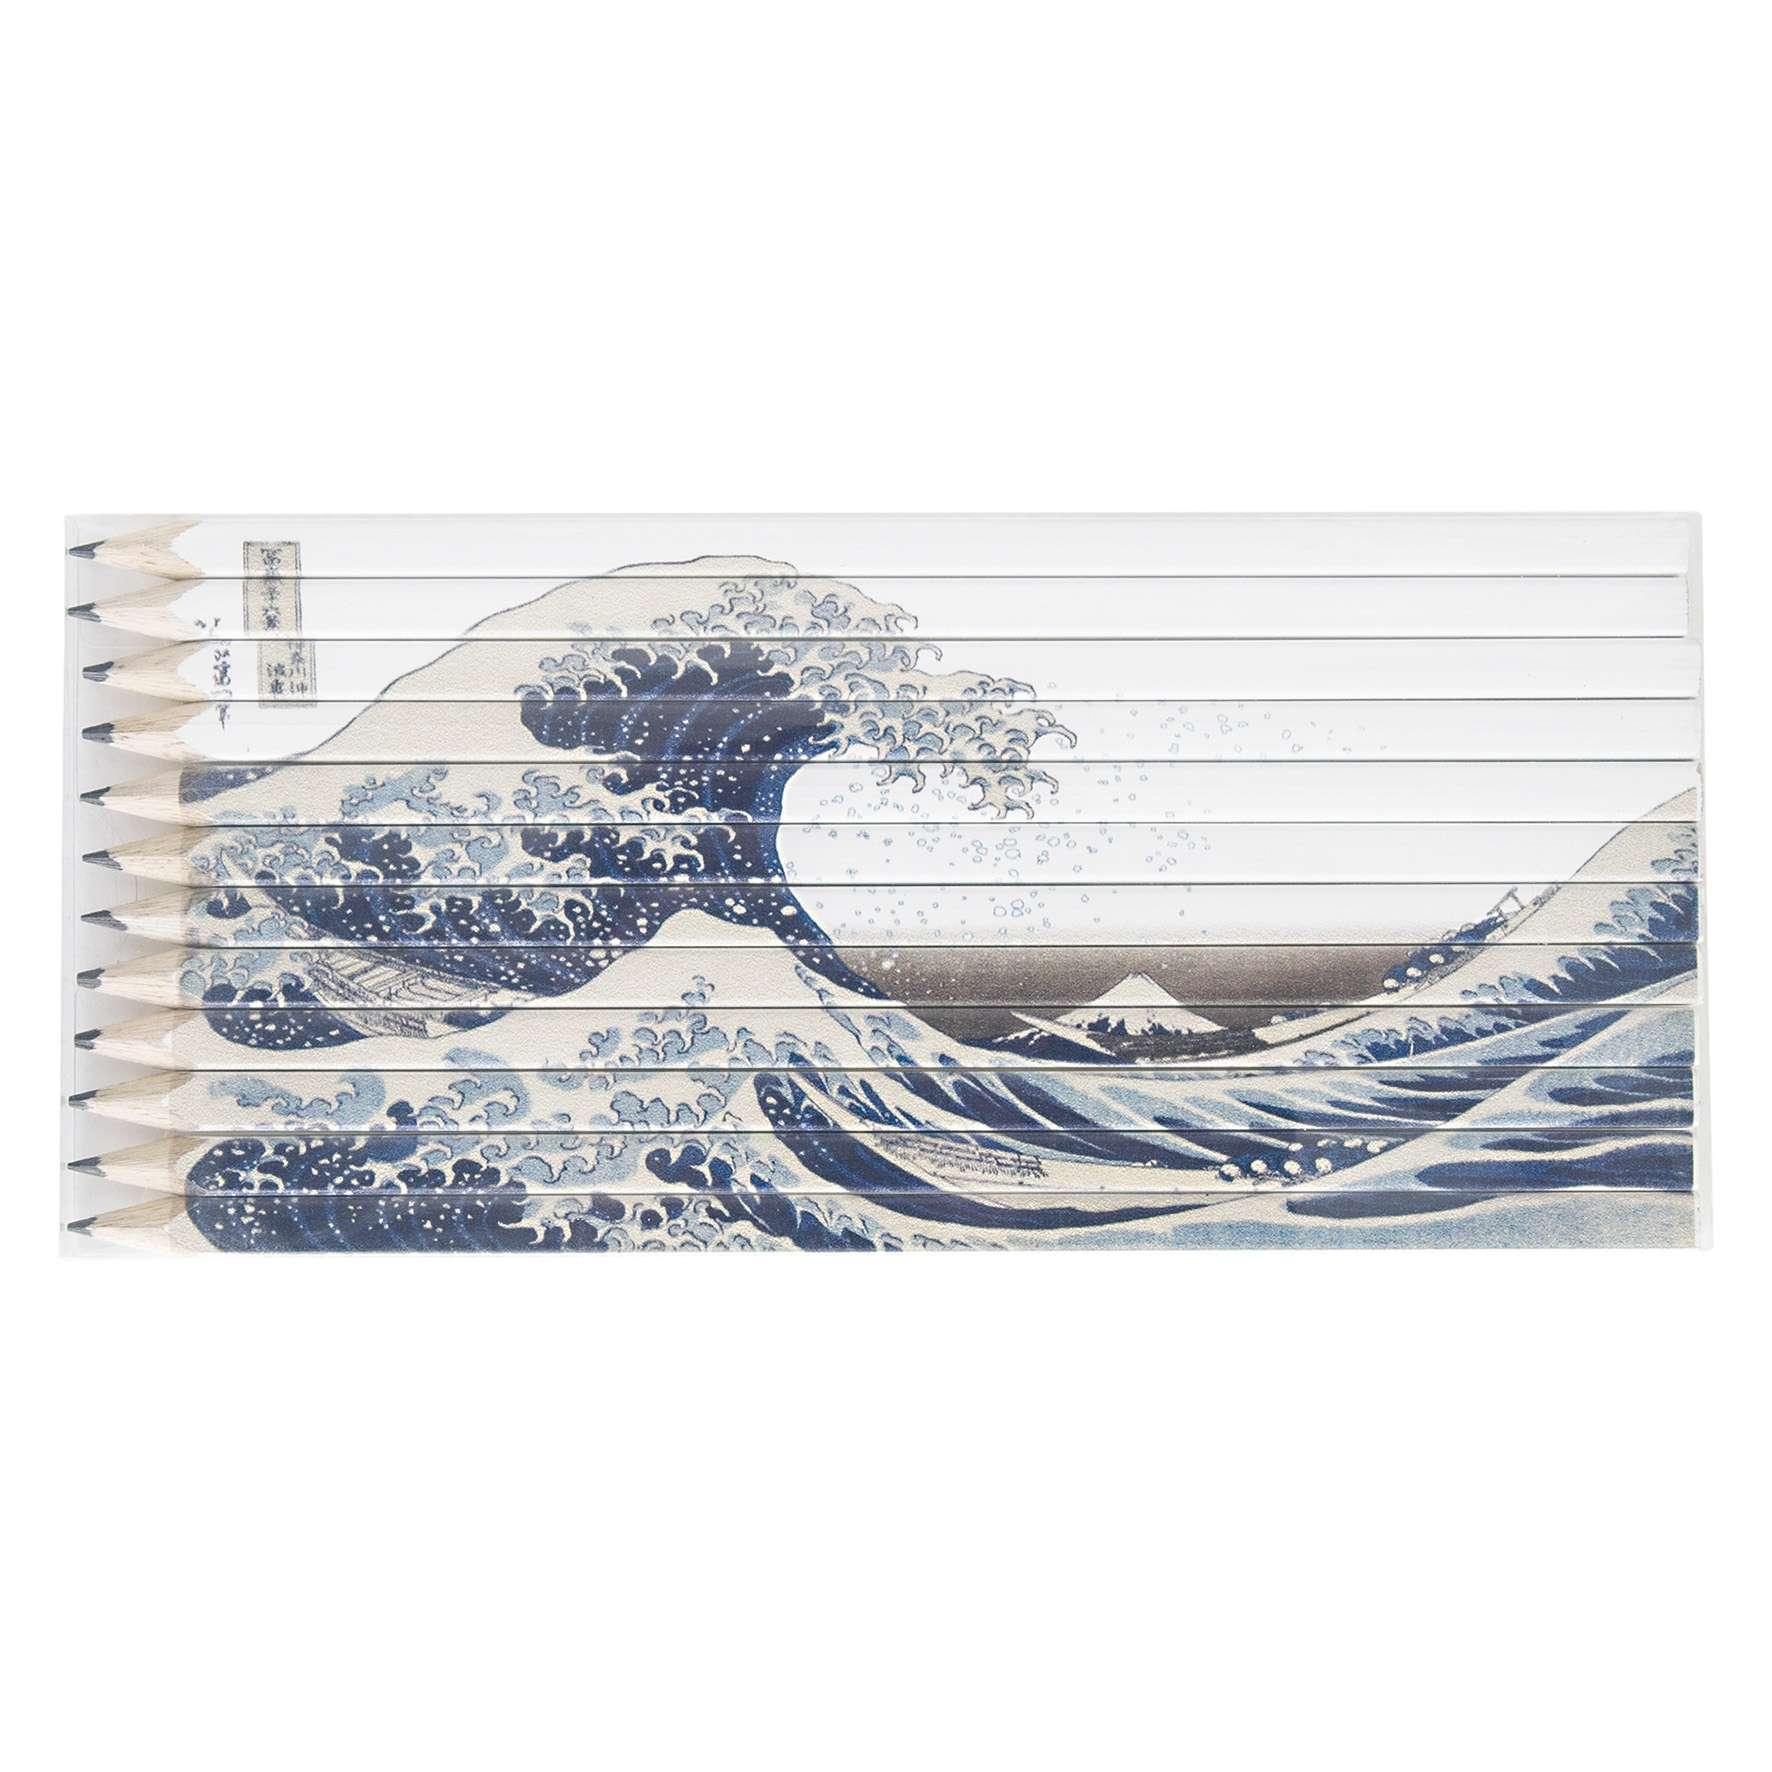 Goodies écologique - Set Quadri 12 crayons publicitaires Graphite 17,6 cm